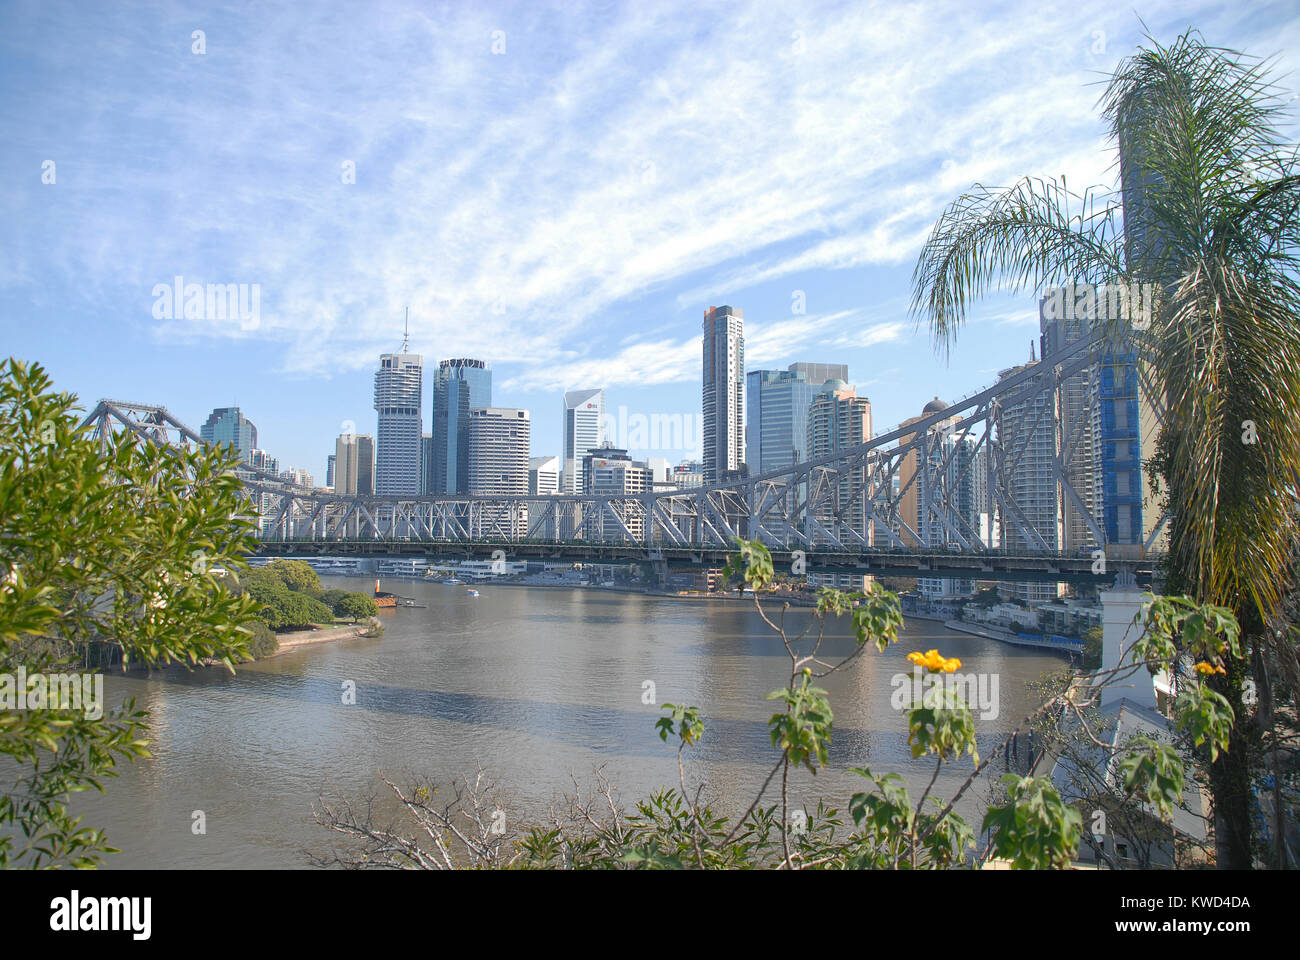 Brisbane, Australia - July 28, 2017: View of Story Bridge and the skyline of Brisbane - Stock Image